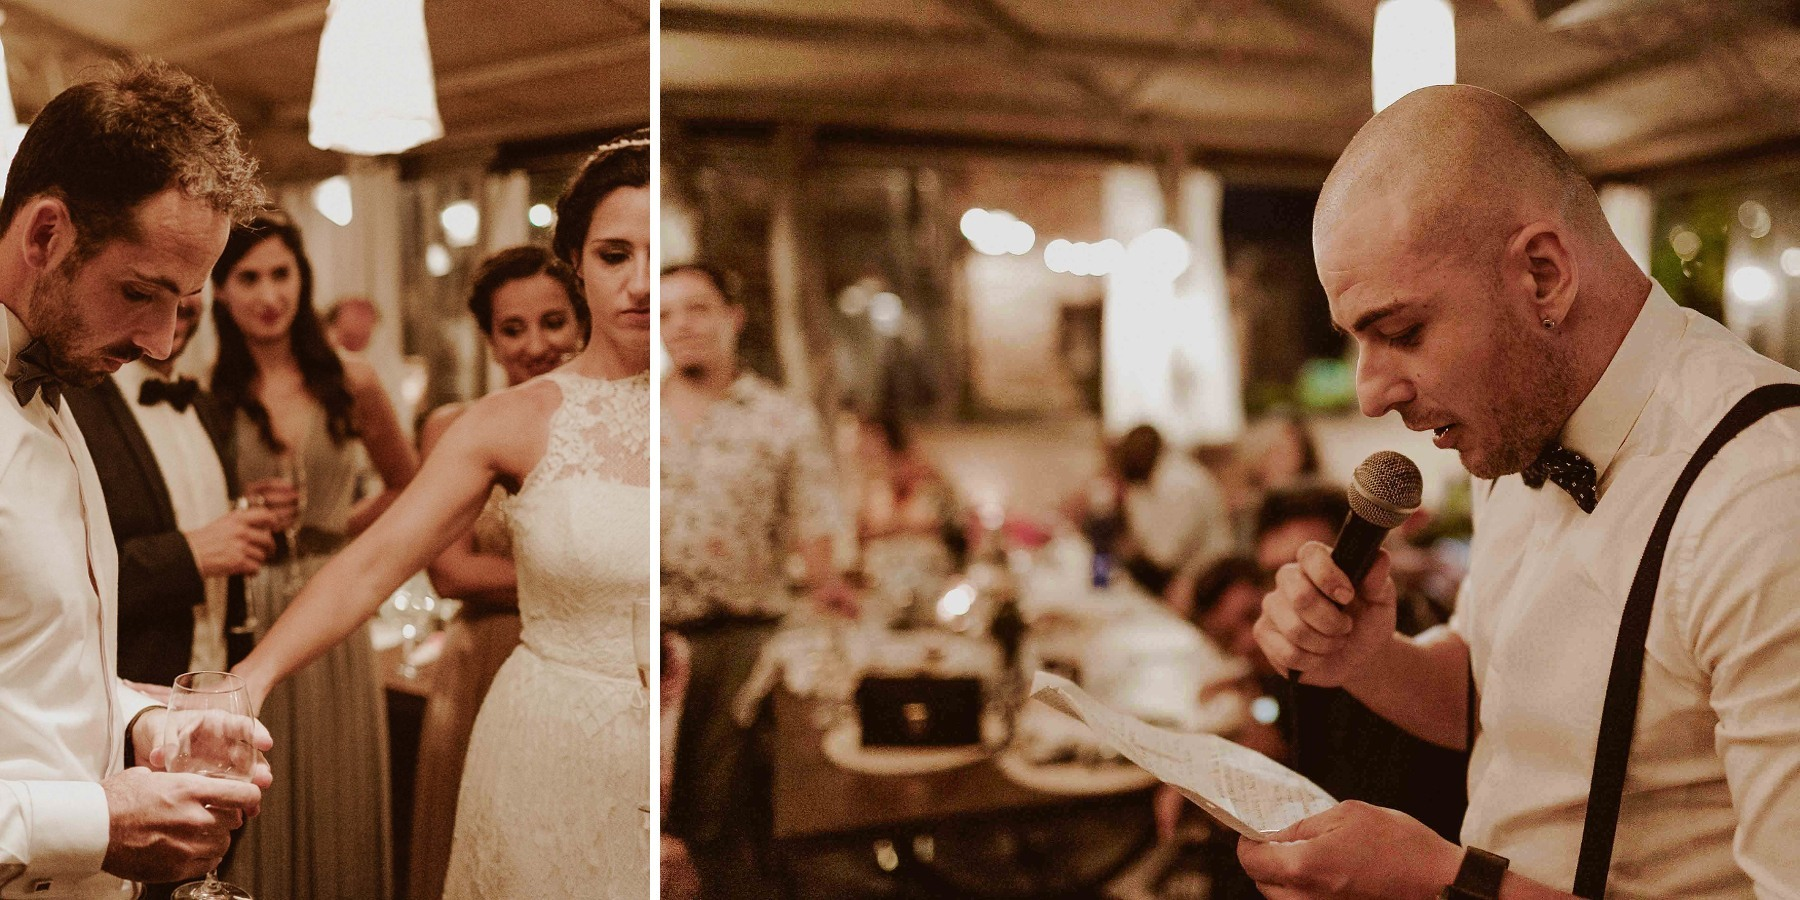 Boda rústica en la montaña. fotgrafo de bodas barcelona_103